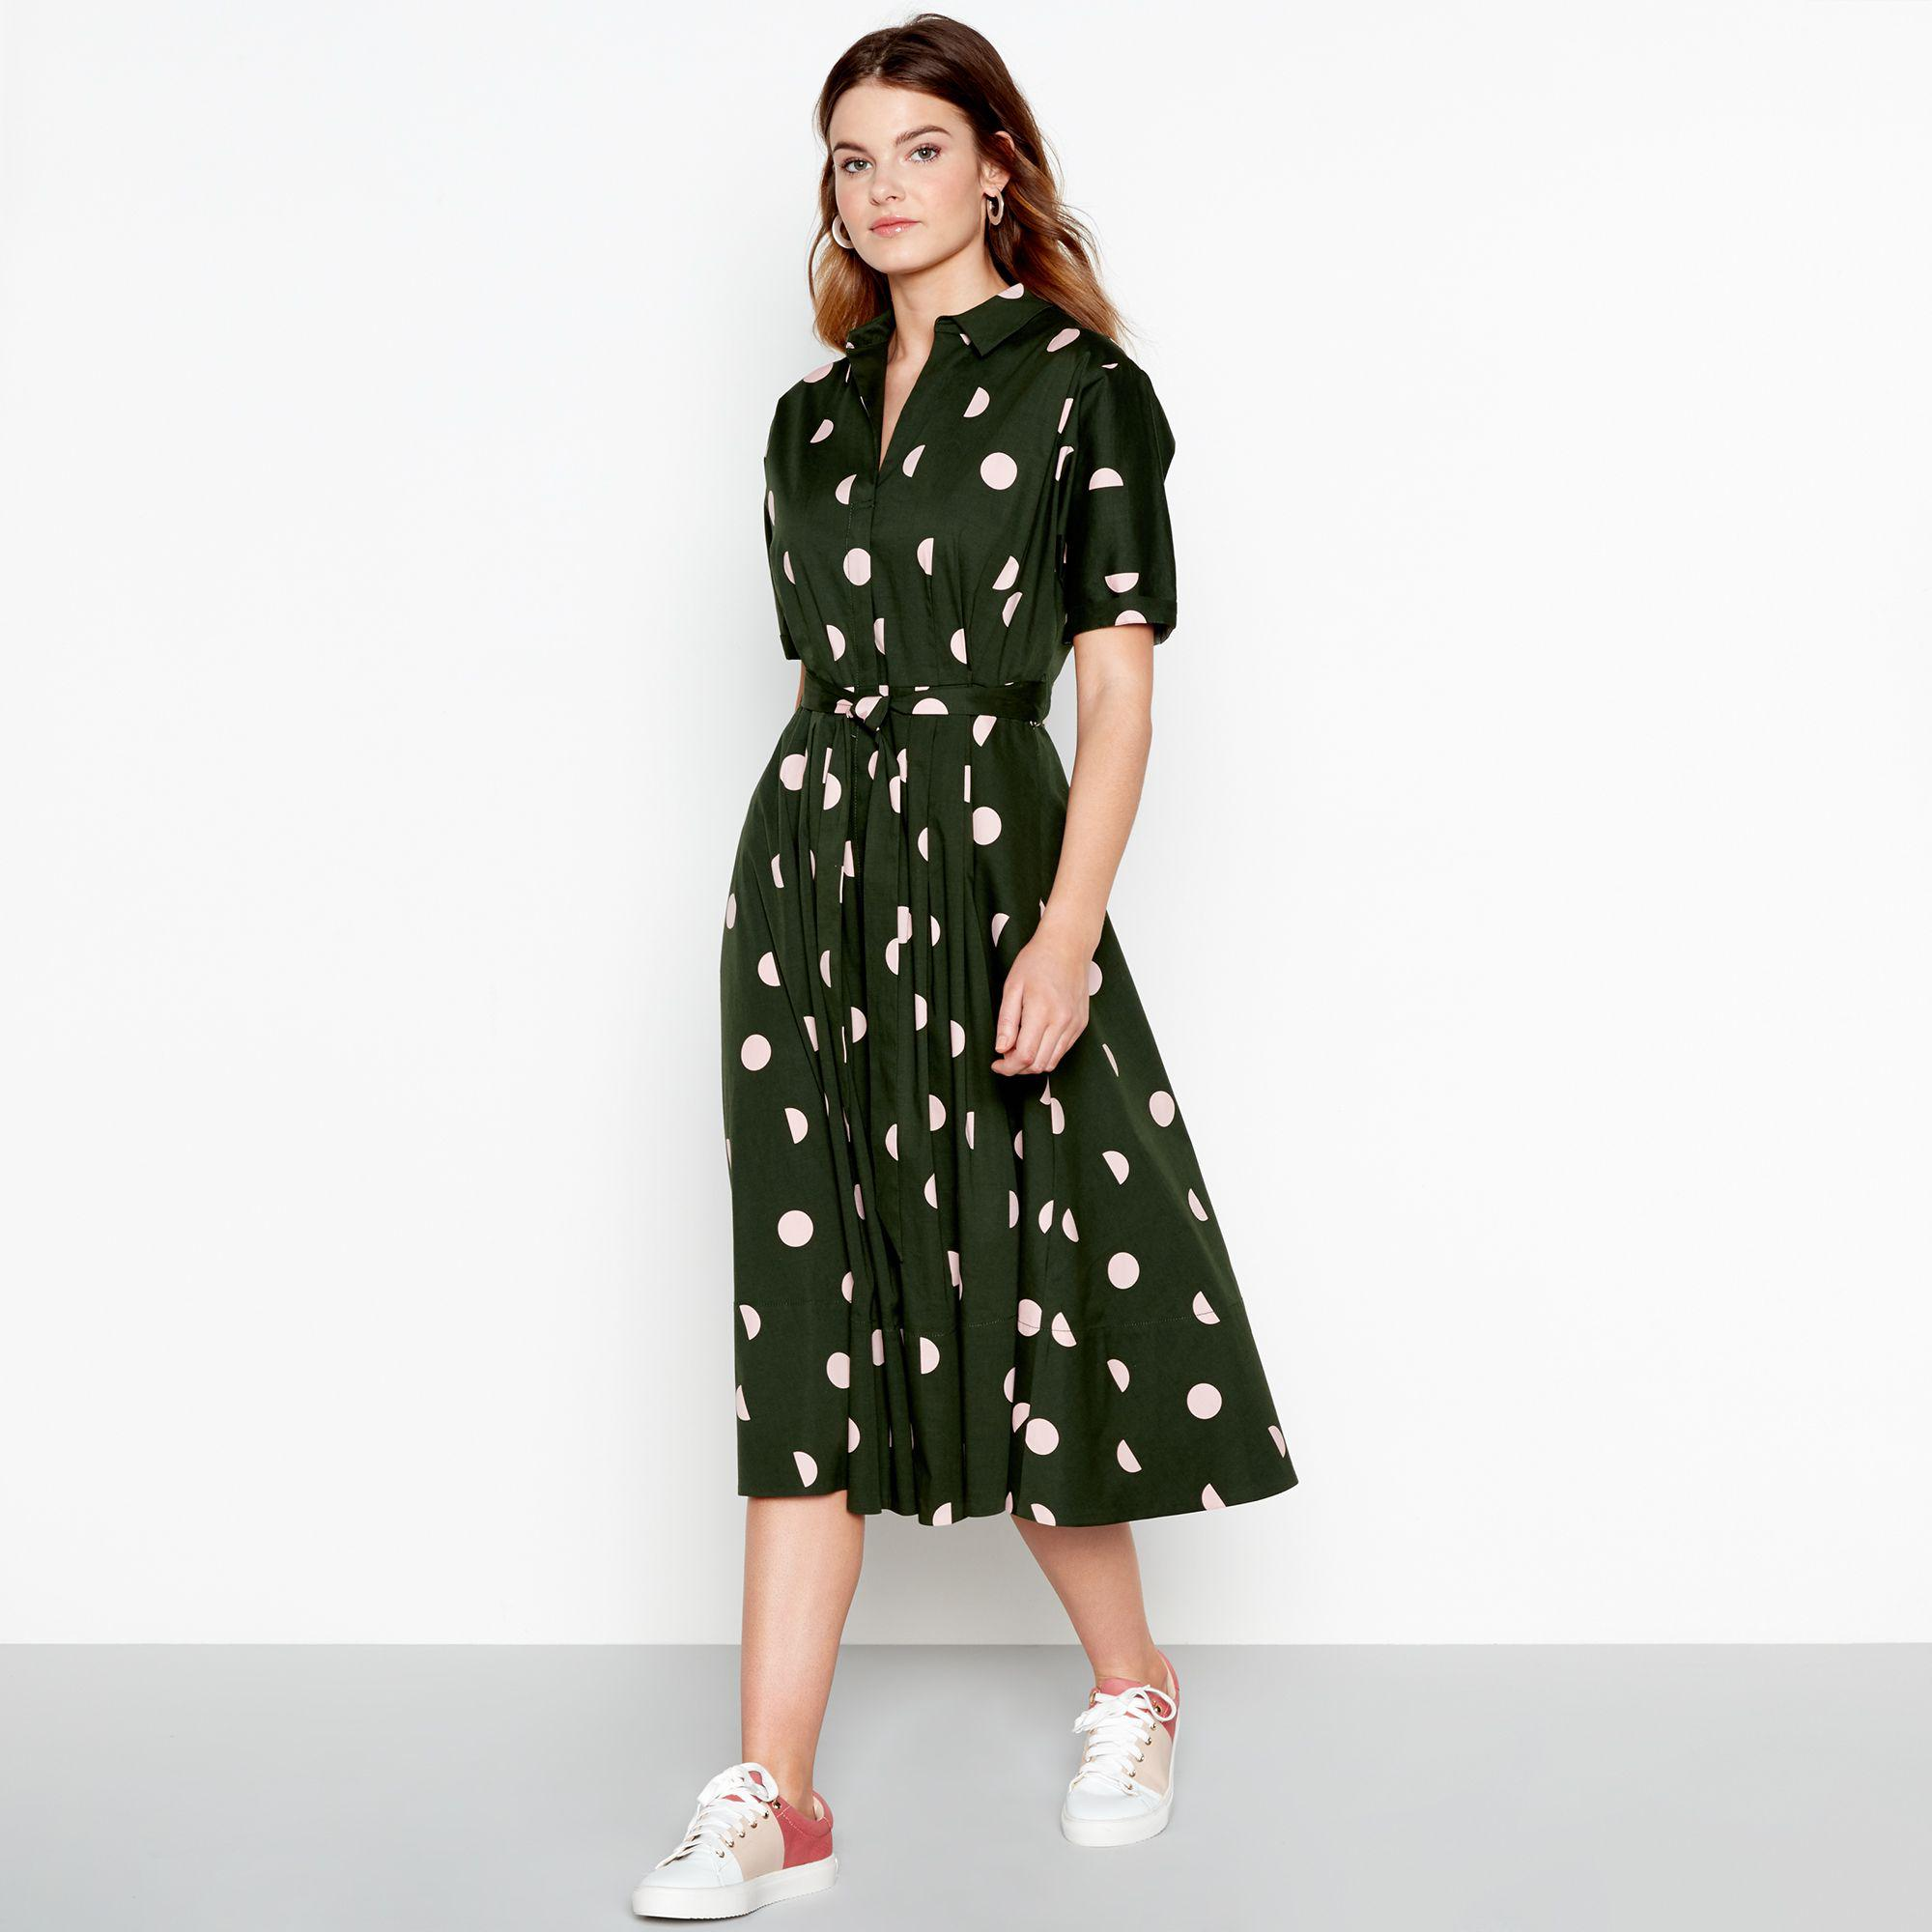 ae308d4bd58c Jasper Conran Full Skirt Shirt Dress